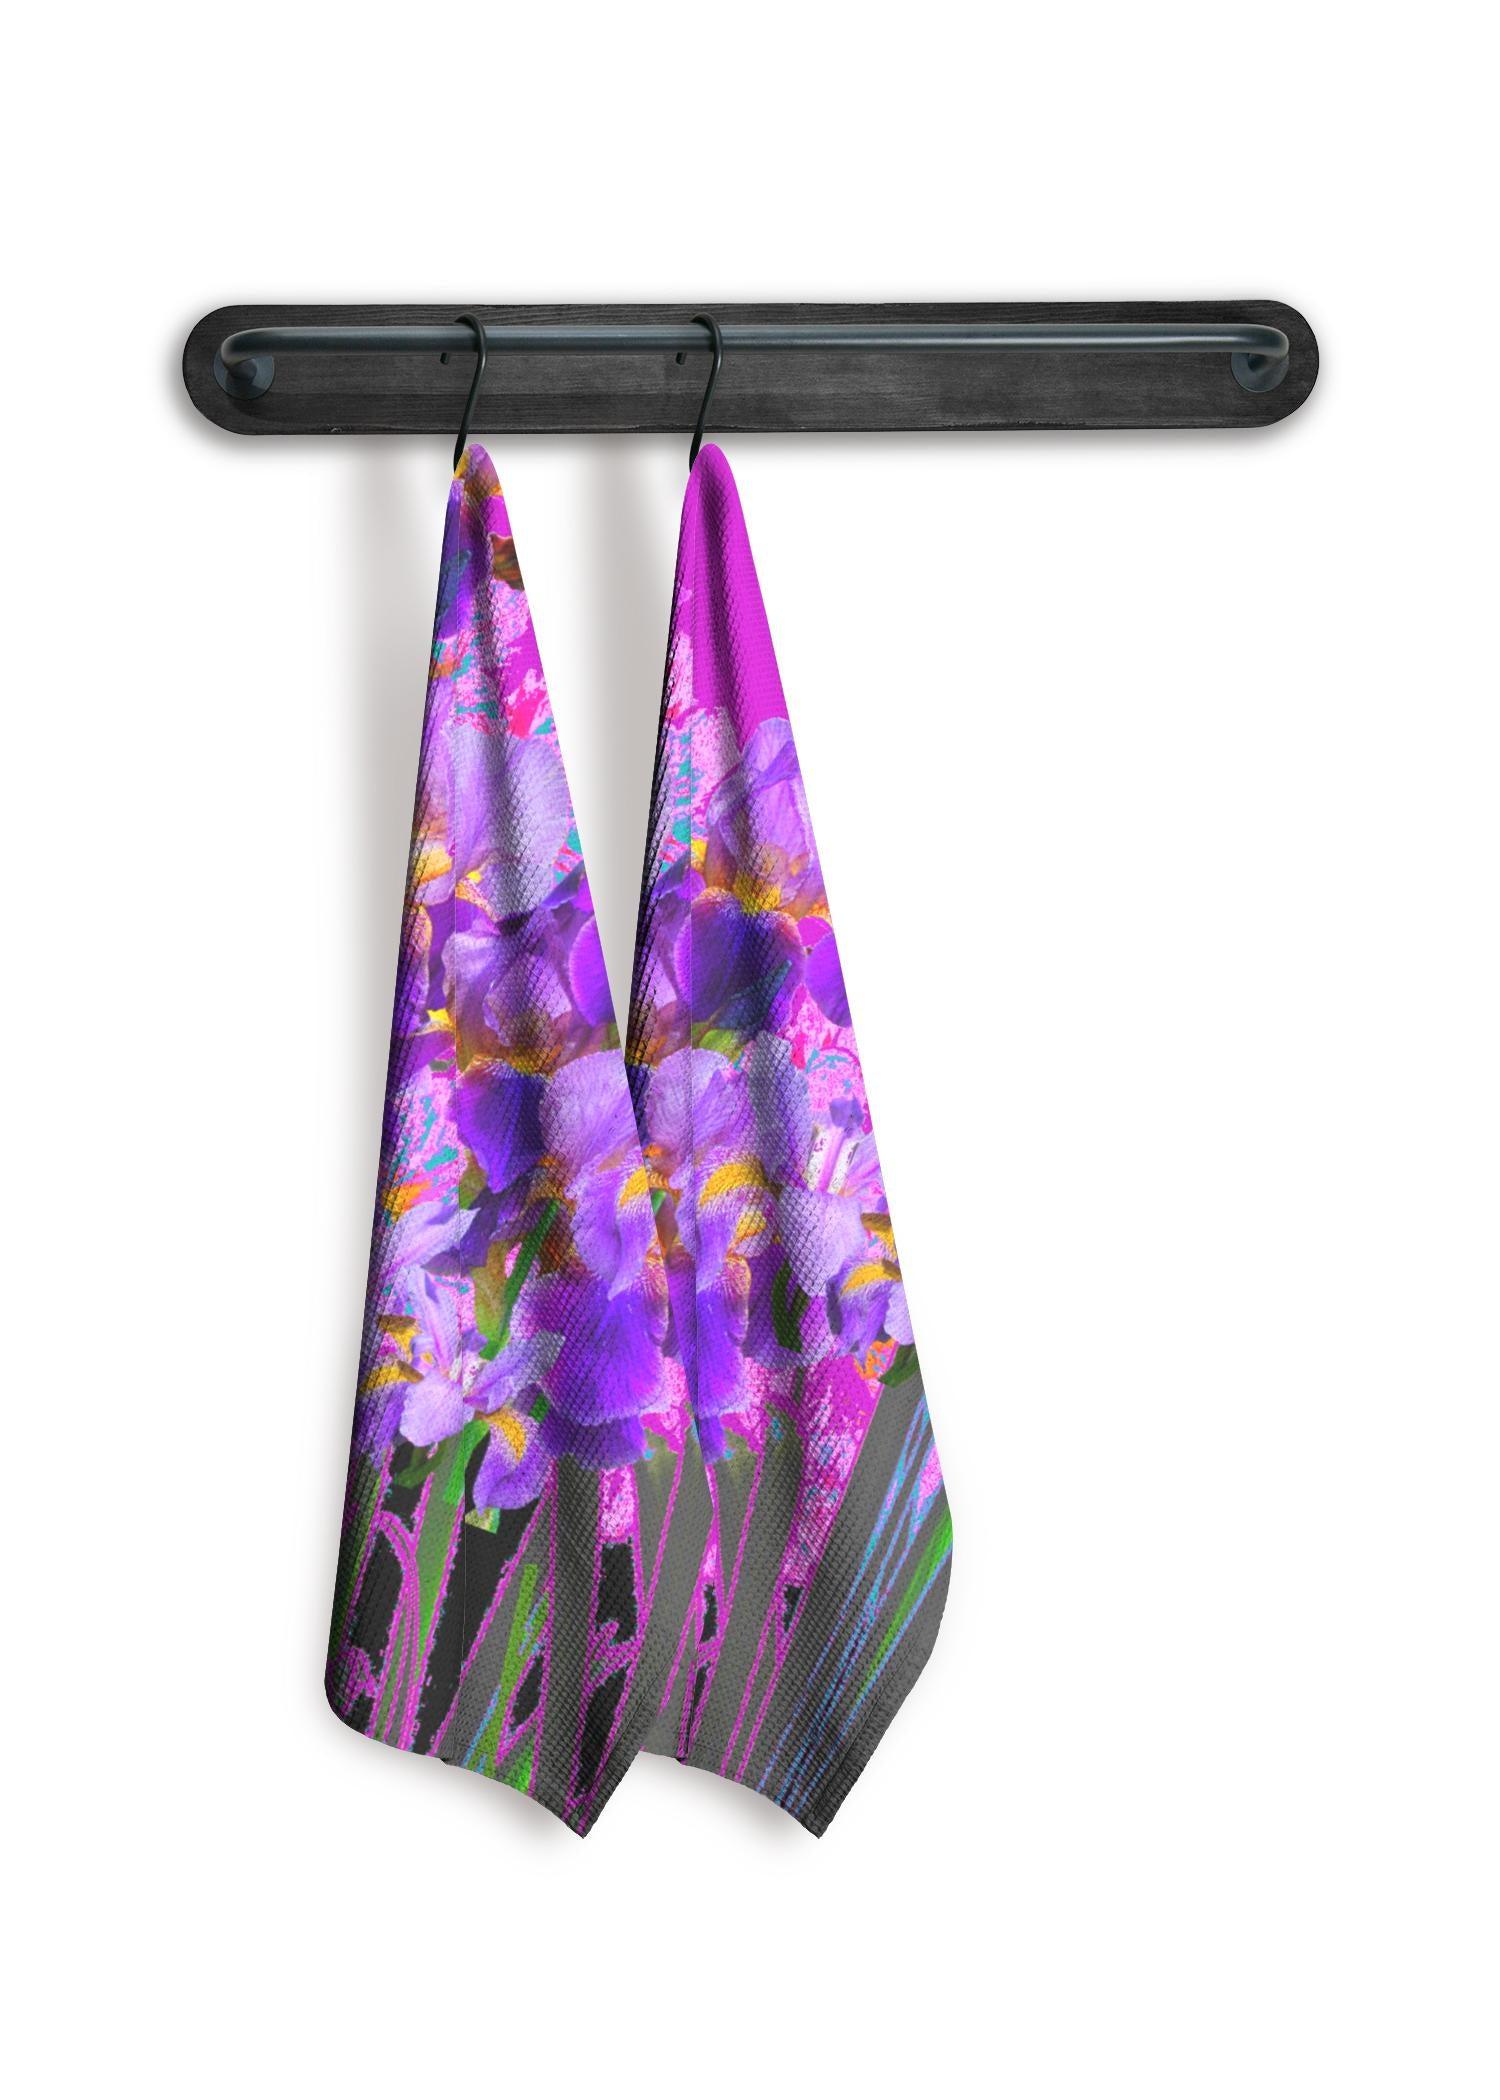 VIDA Tea Towel Set of 2 - Purple Garden Iris Art by VIDA Original Artist  - Size: Plain set